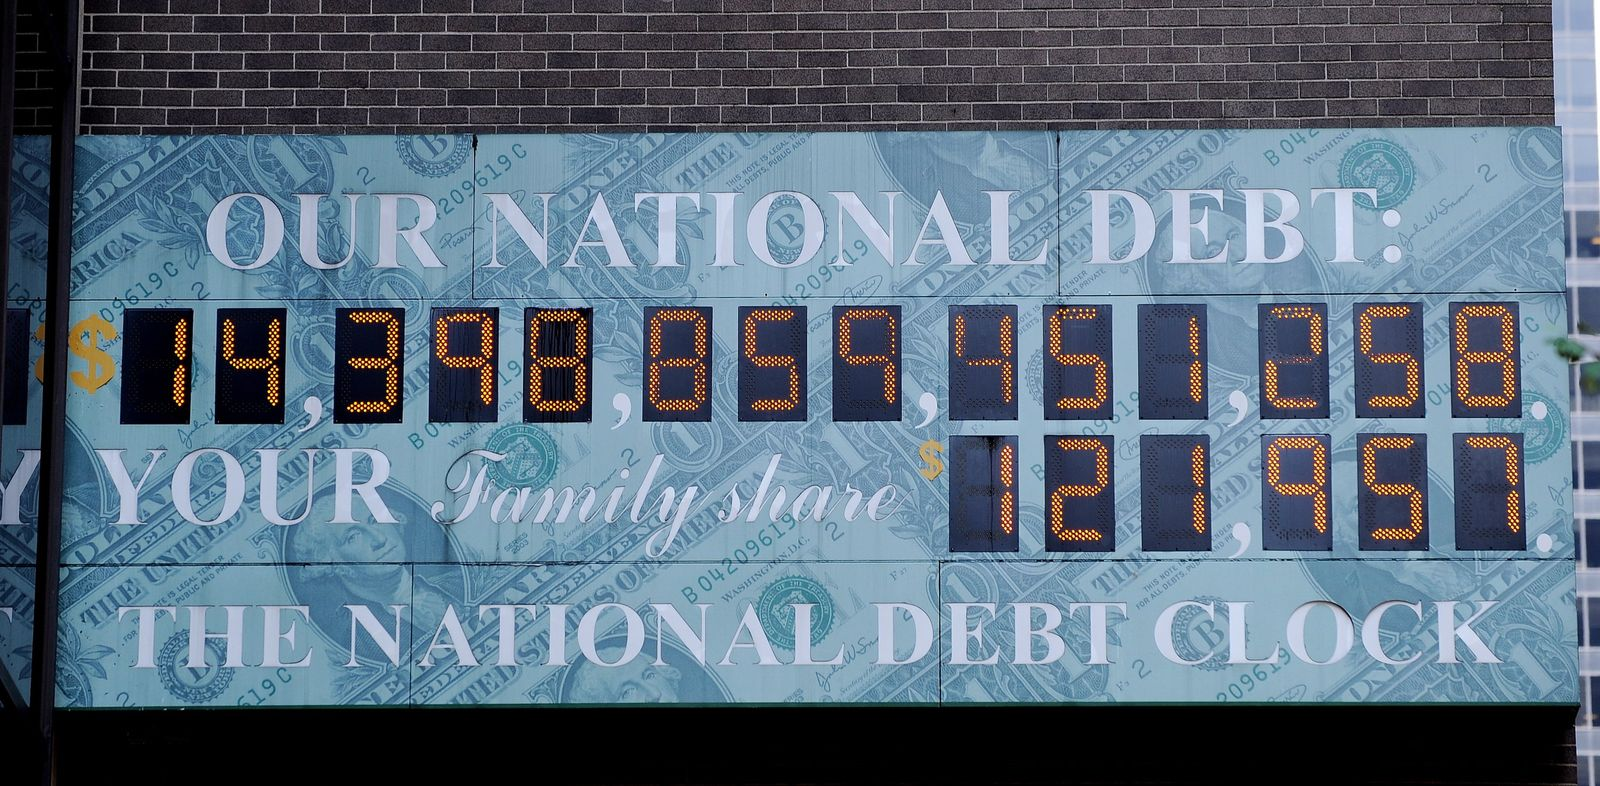 National debt clock in New York